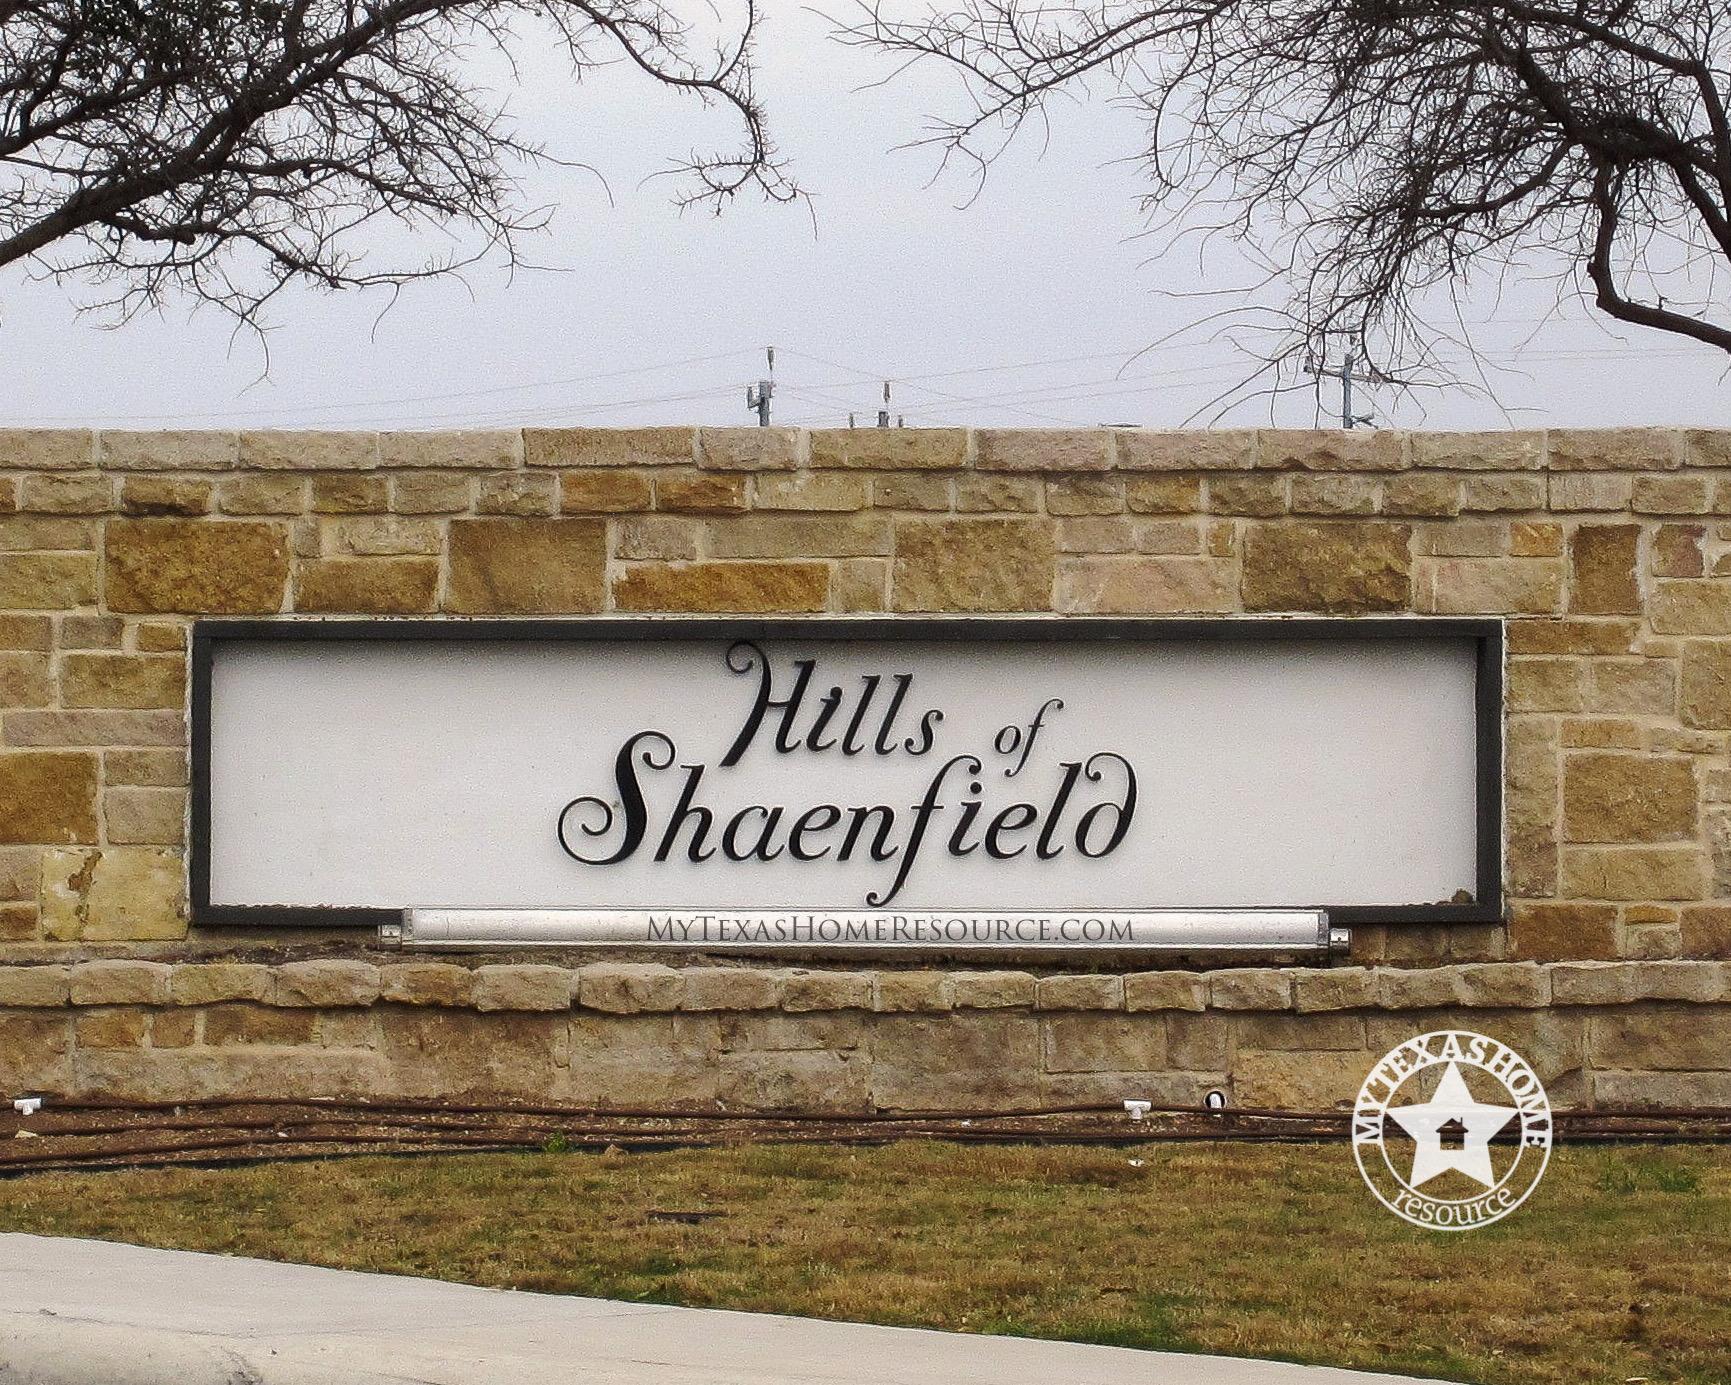 Hills of Shaenfield Community San Antonio, TX